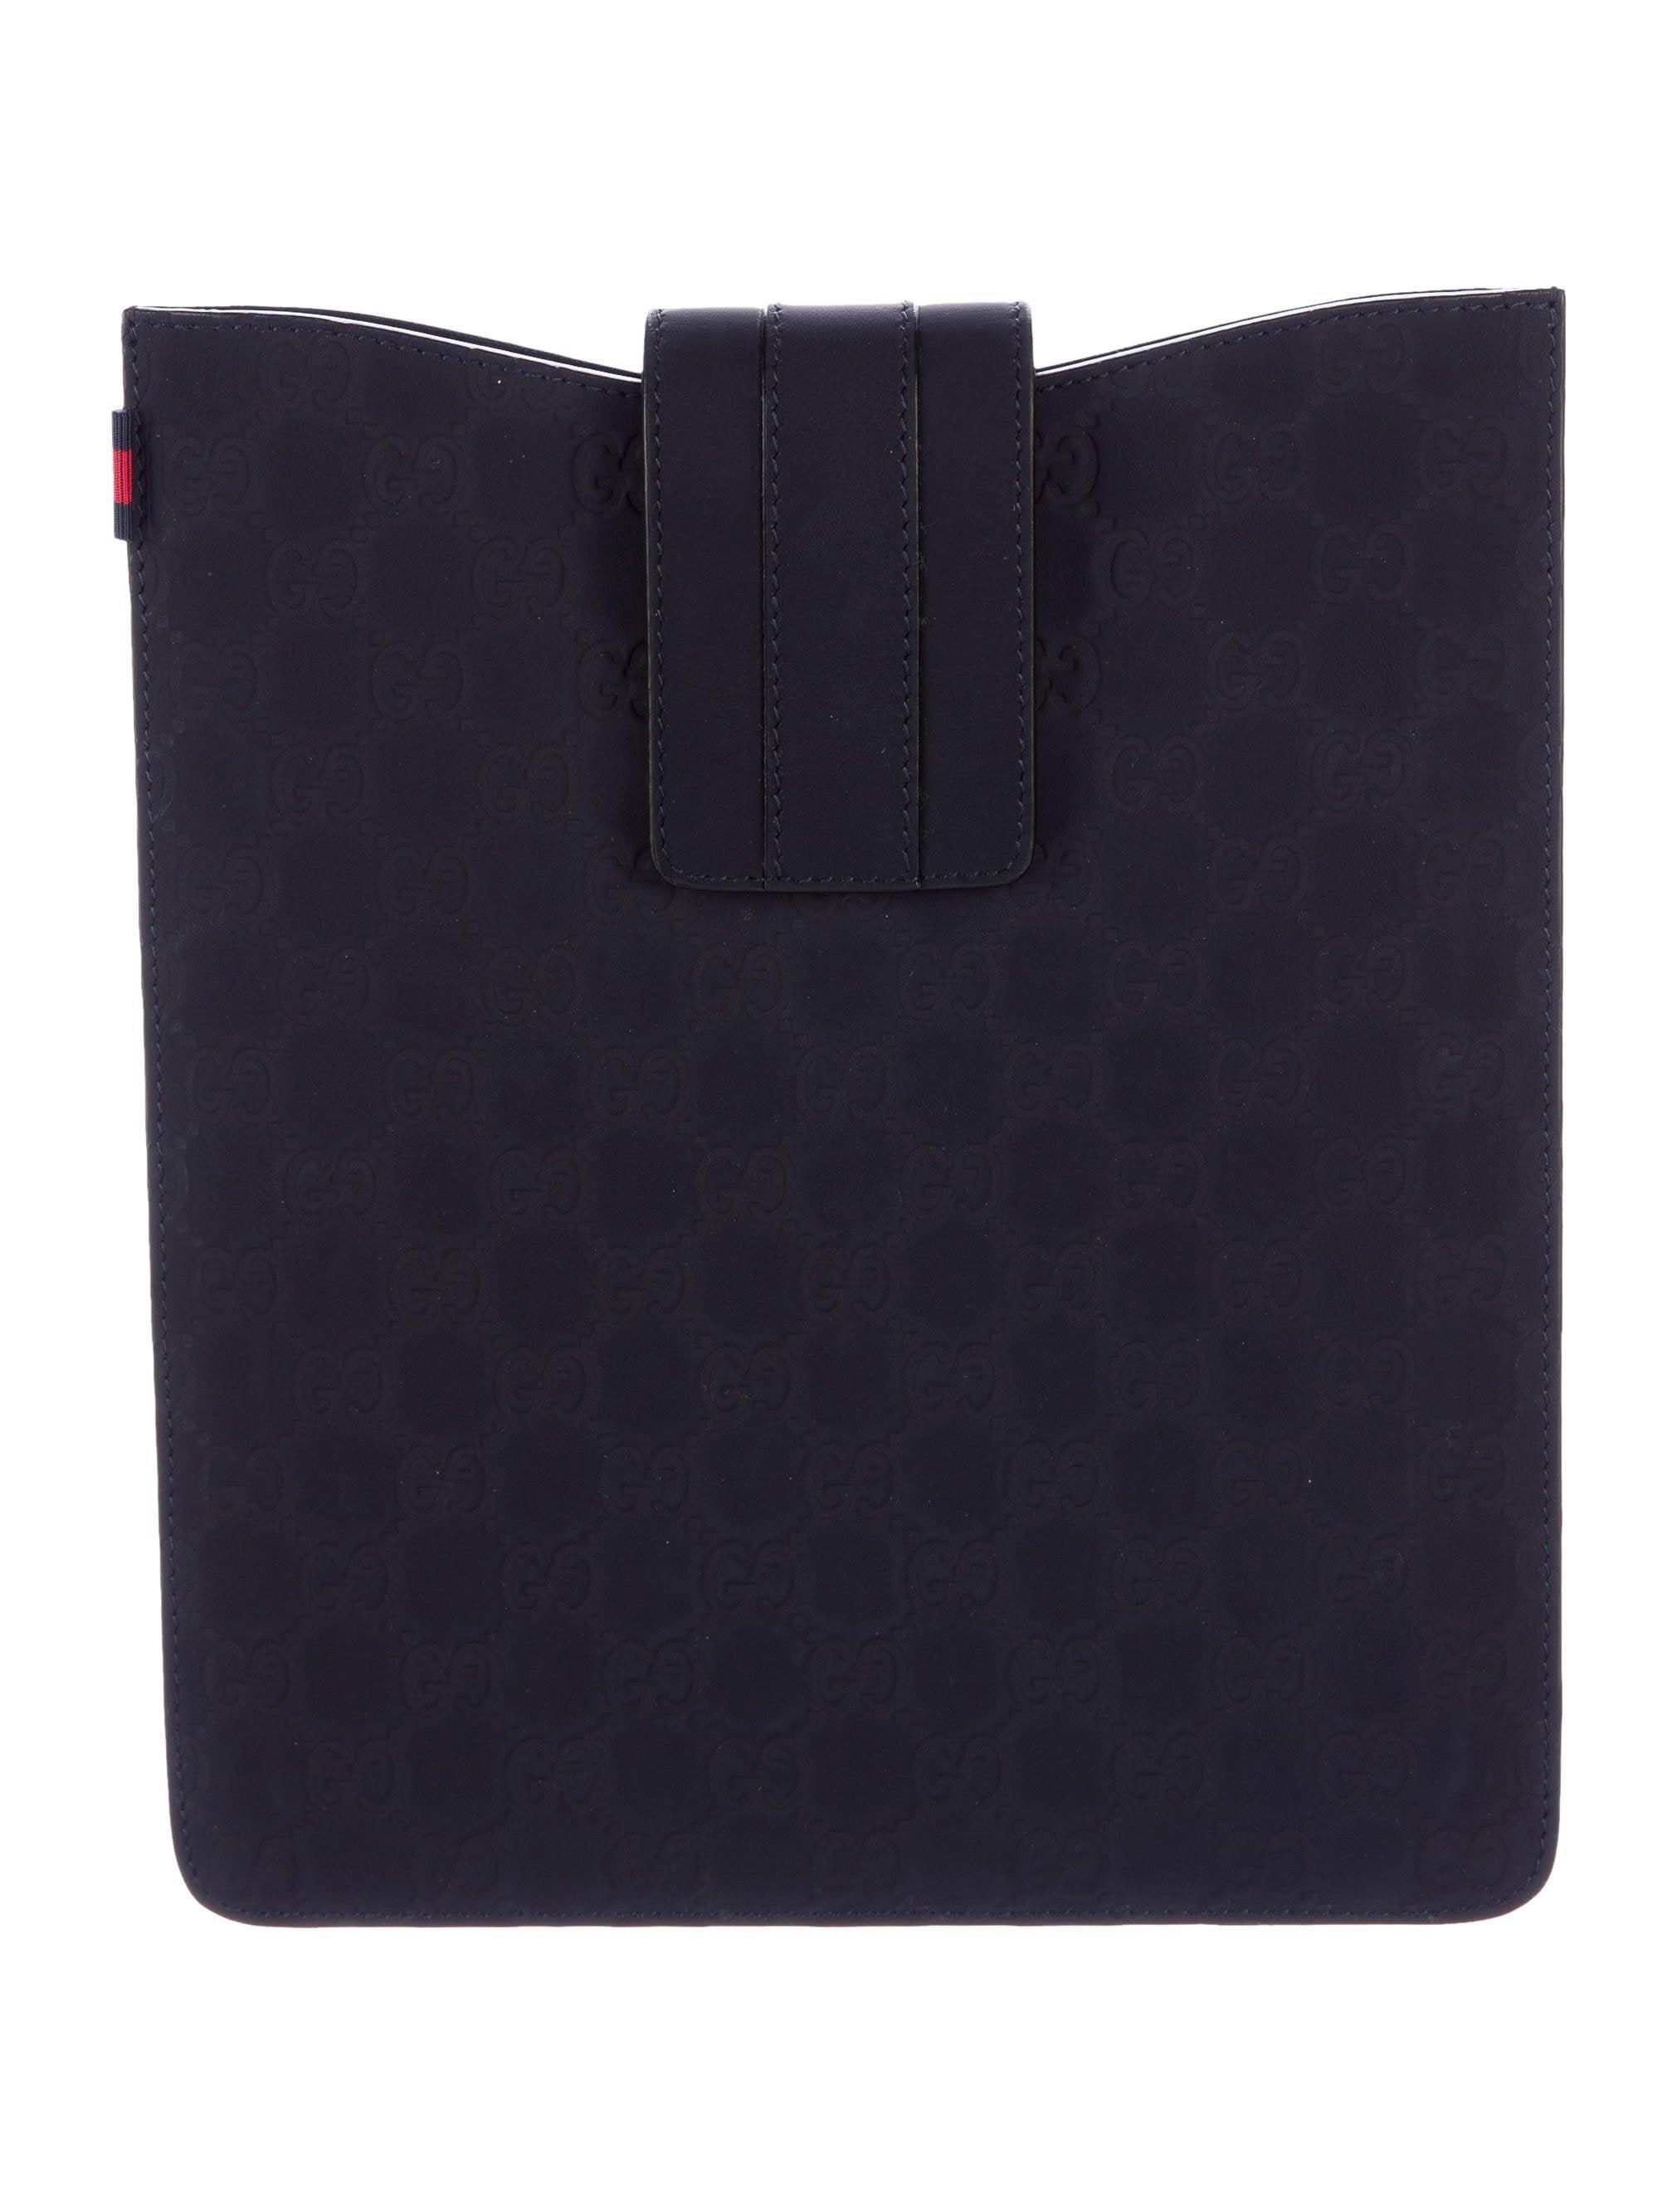 0d13978203a Gucci Guccissima Matte iPad Case w  Tags - Technology - GUC136167 ...